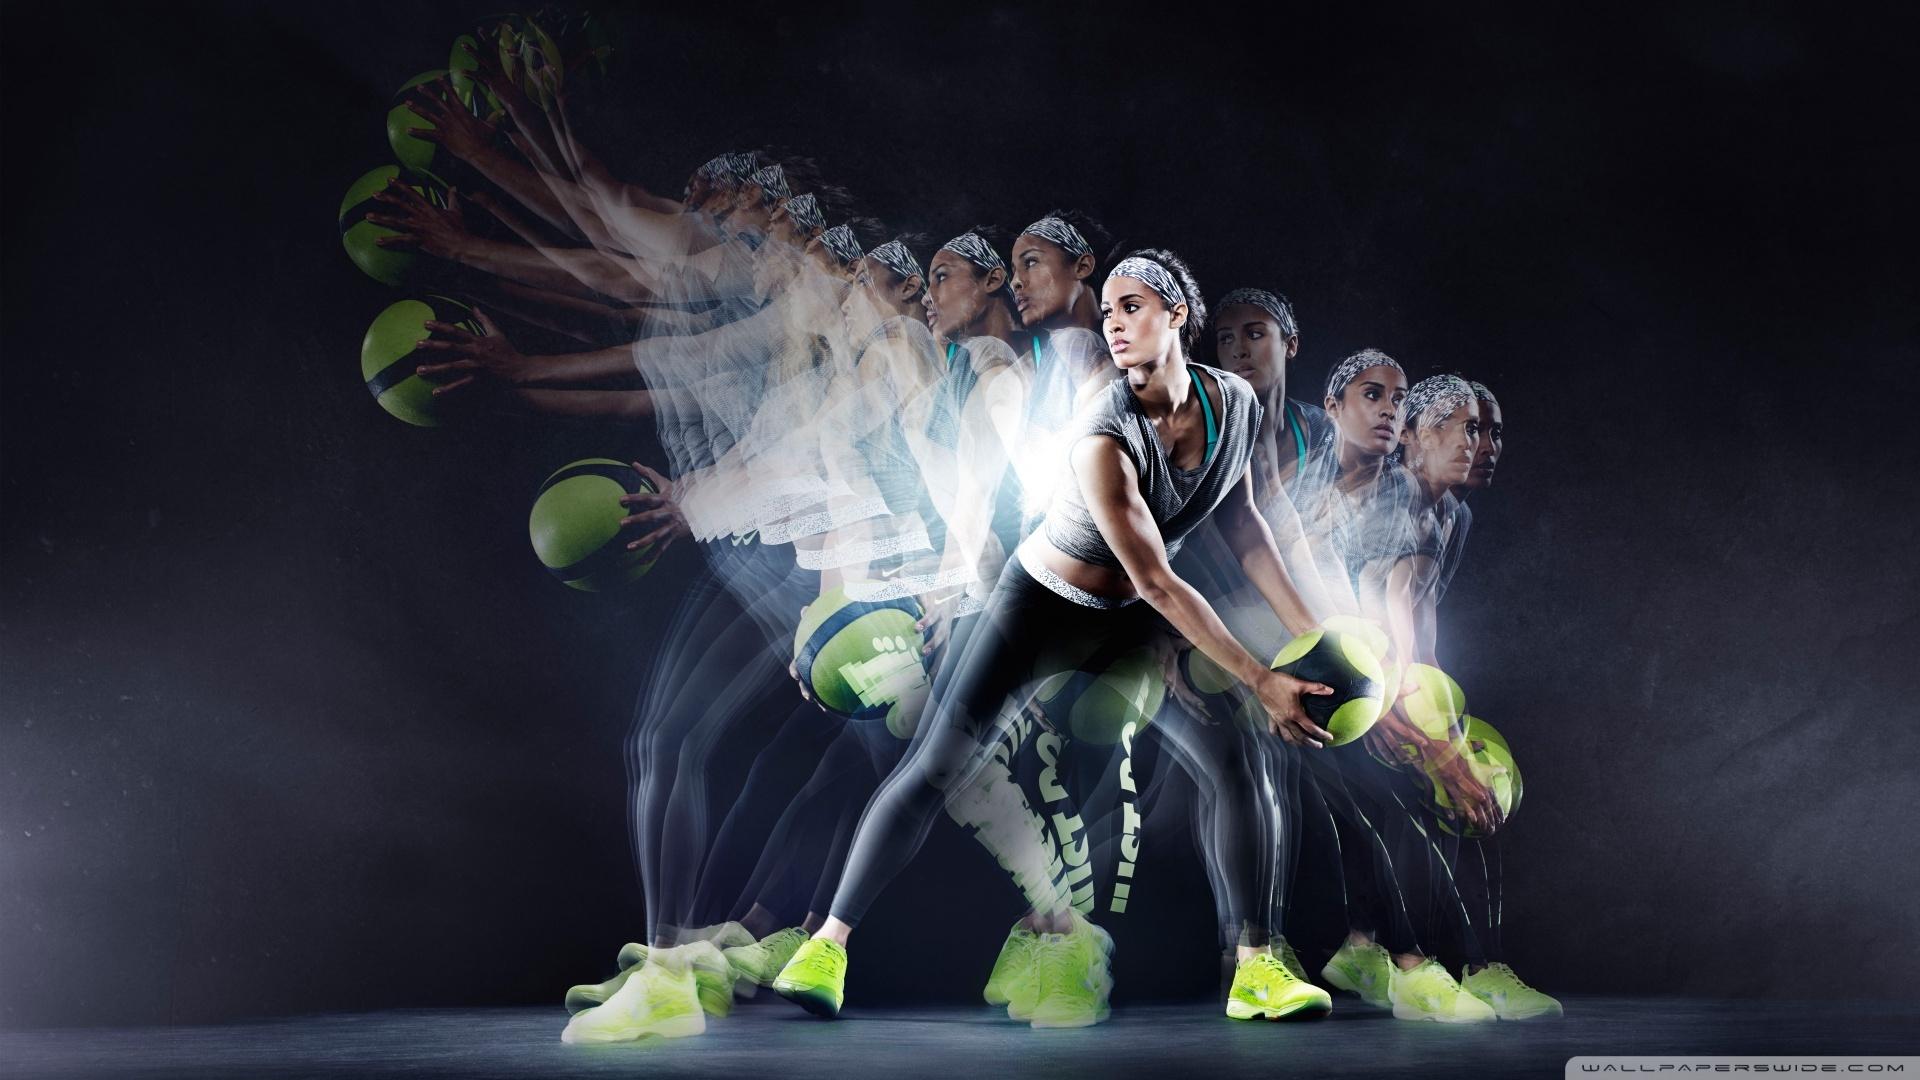 Download Free WallpaperWomen Fitness Ball Workout